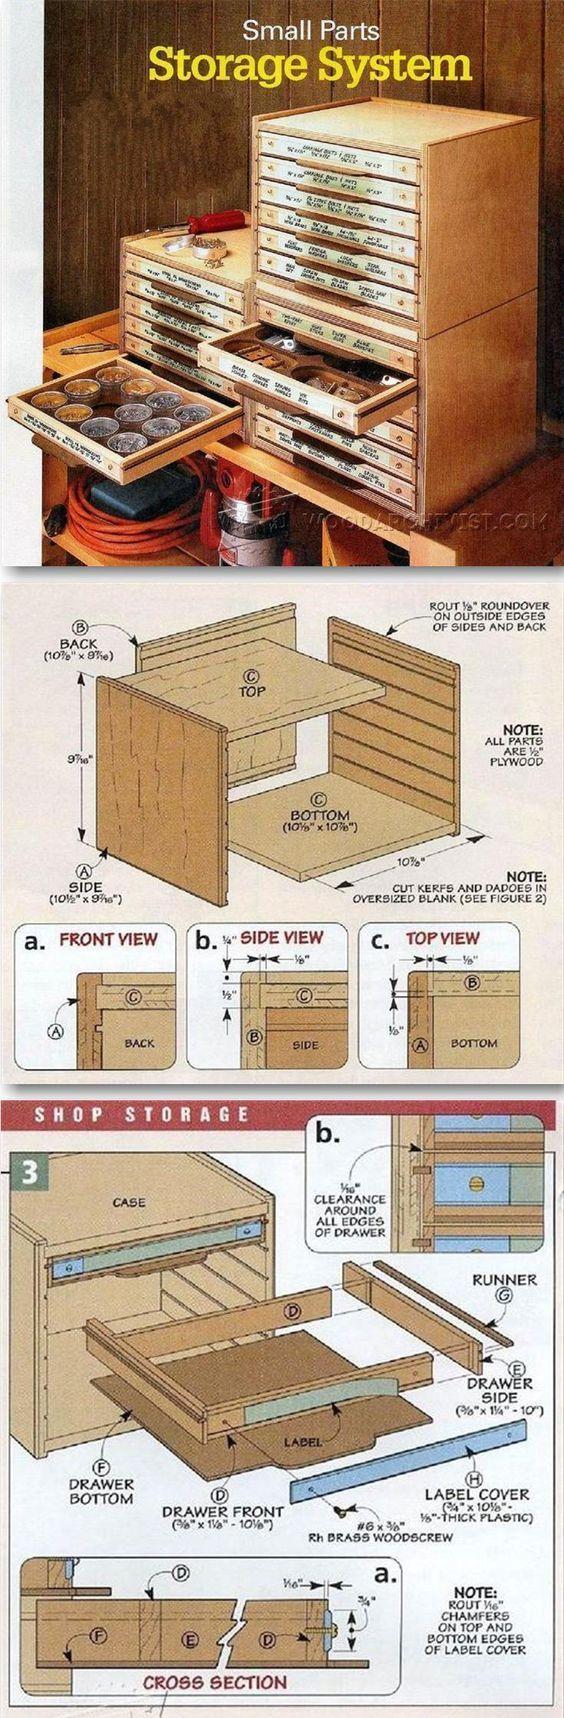 Small Parts Storage System Plans - Workshop Solutions Plans, Tips and Tricks | WoodArchivist.com